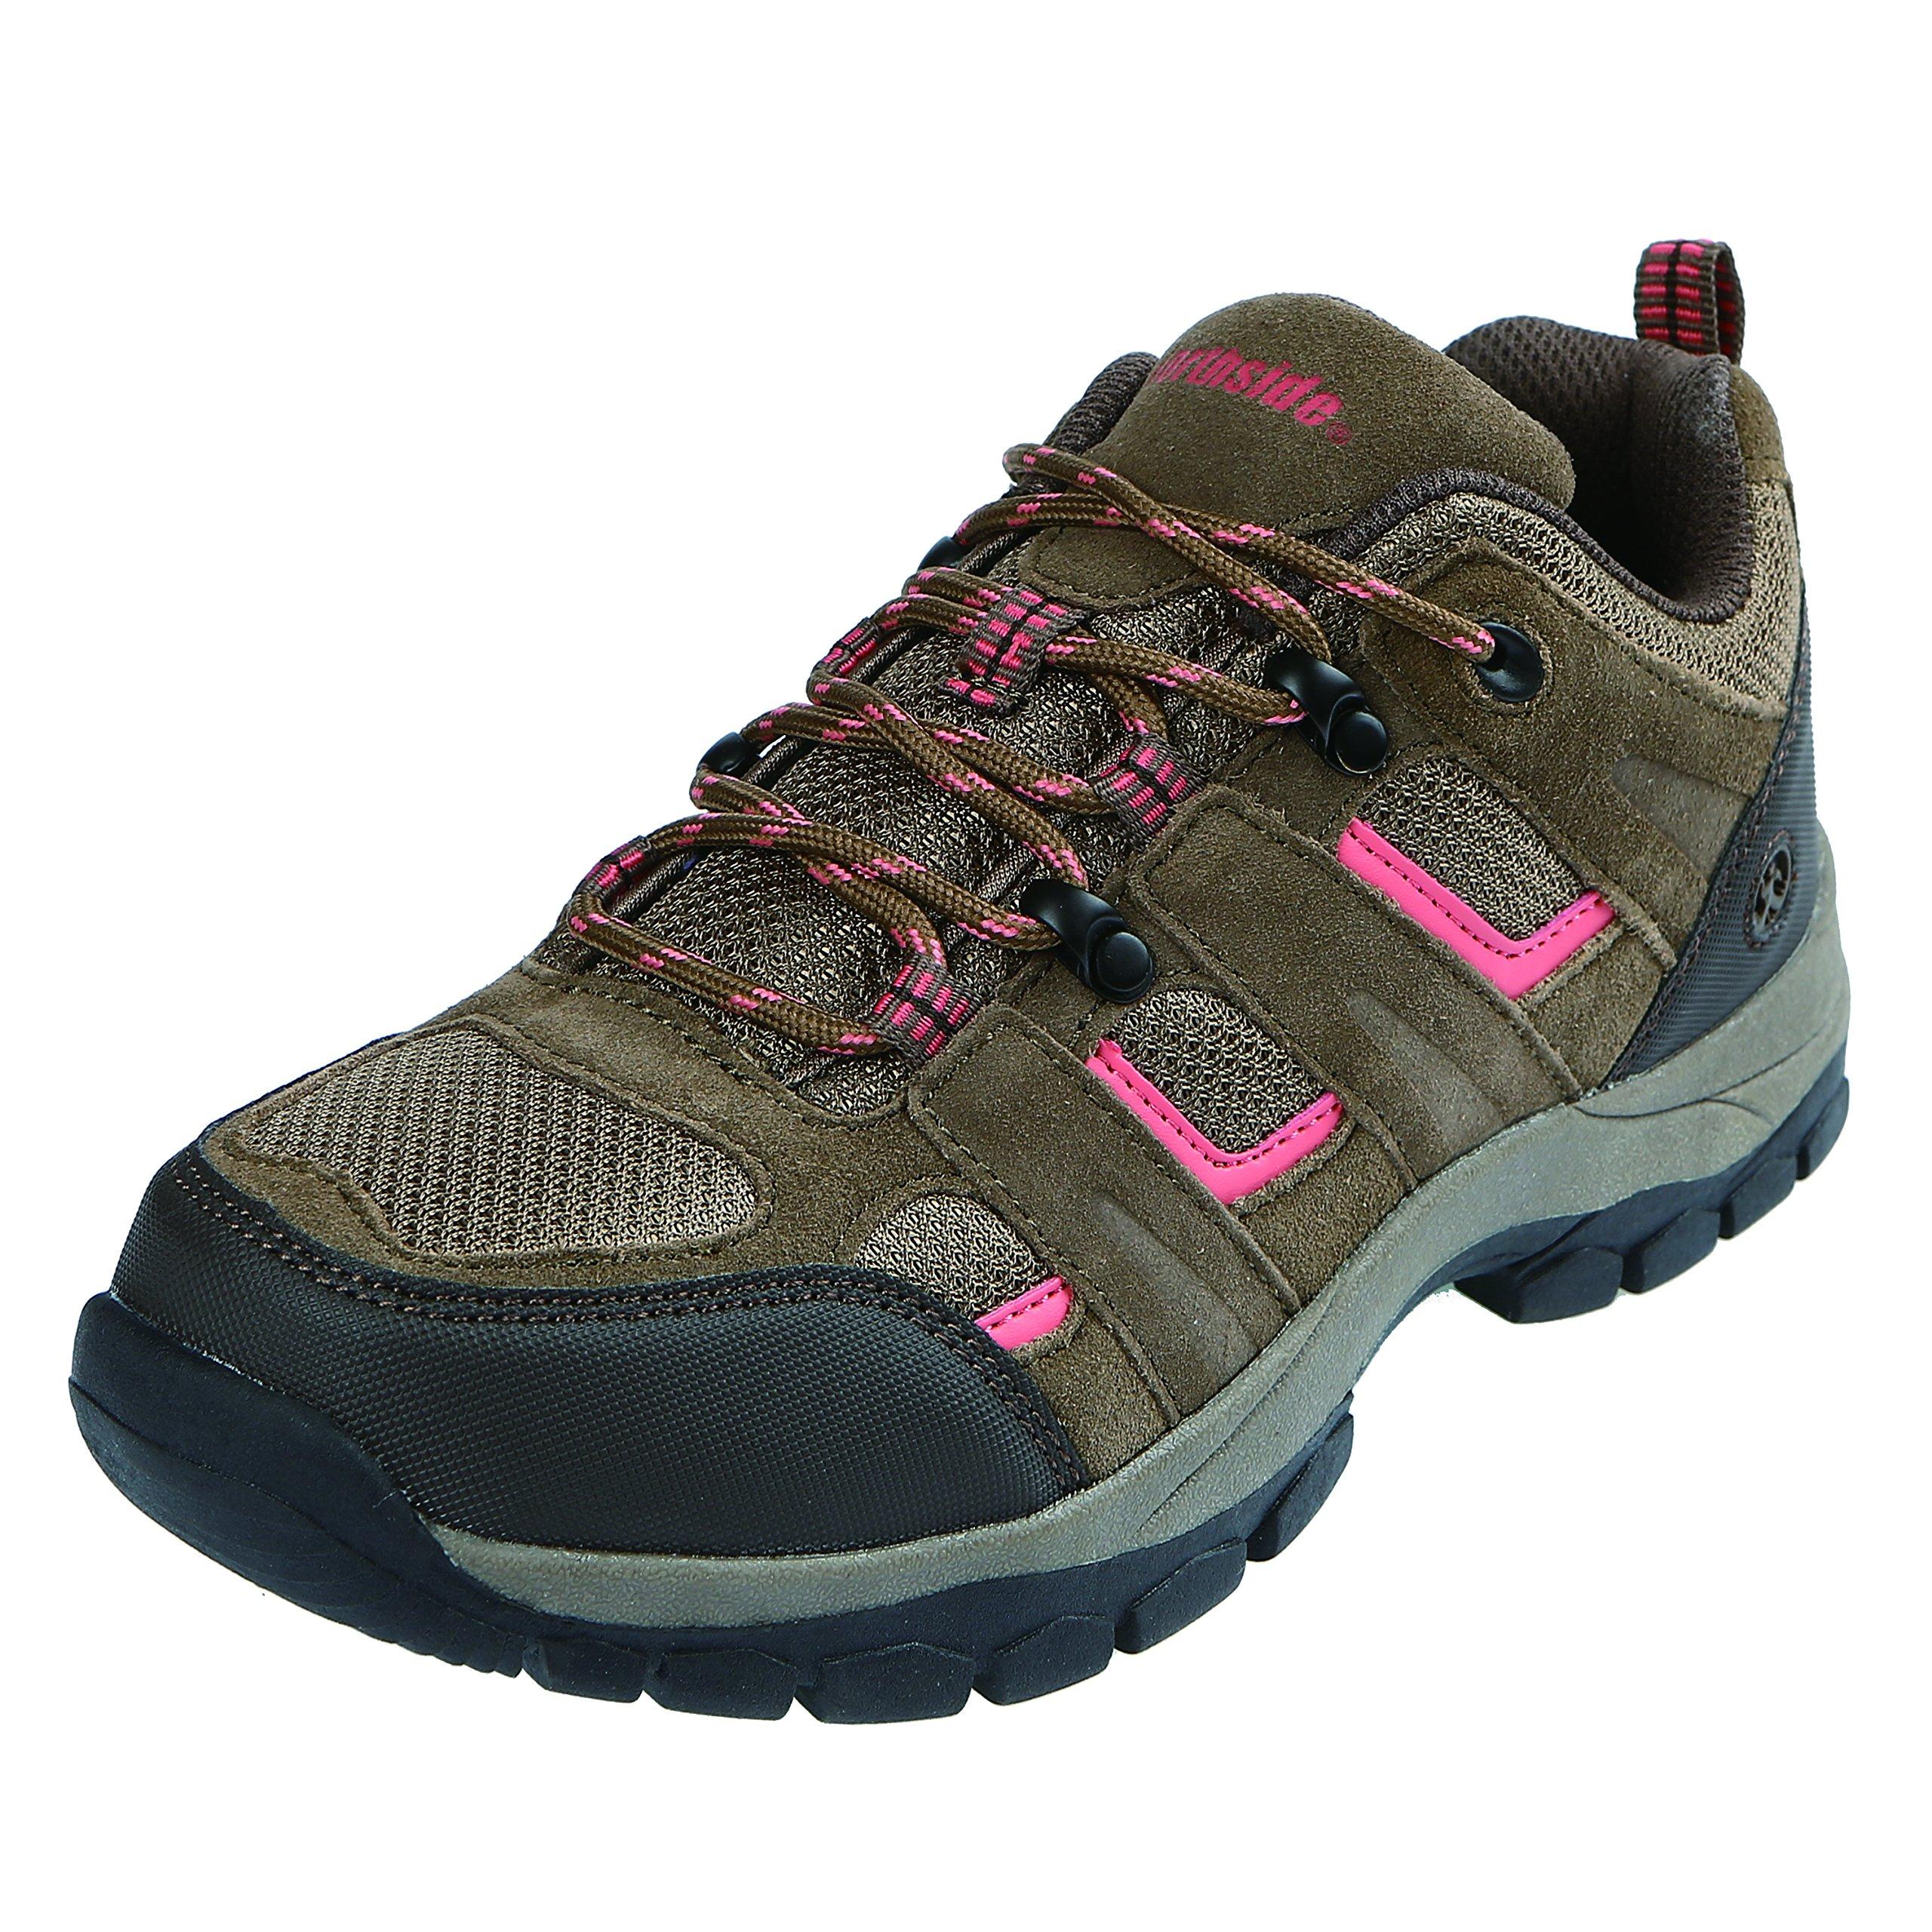 Northside Women's Monroe Low Hiking Shoe, Tan/Coral, Size 6 M US